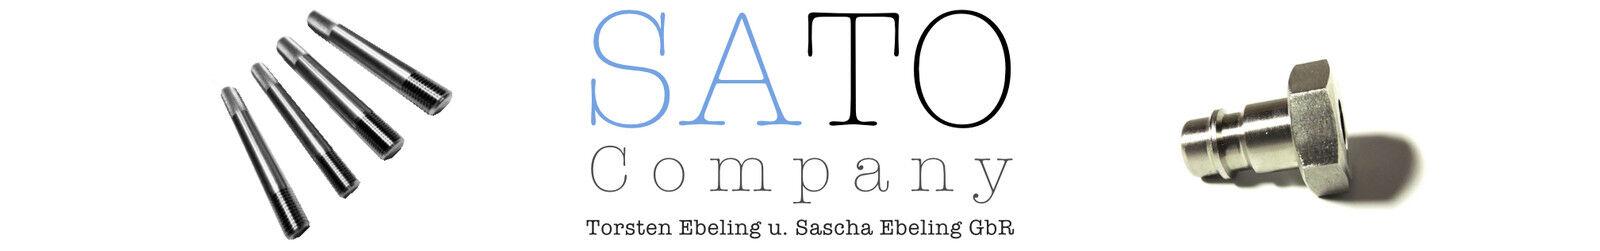 SATO-COMPANY